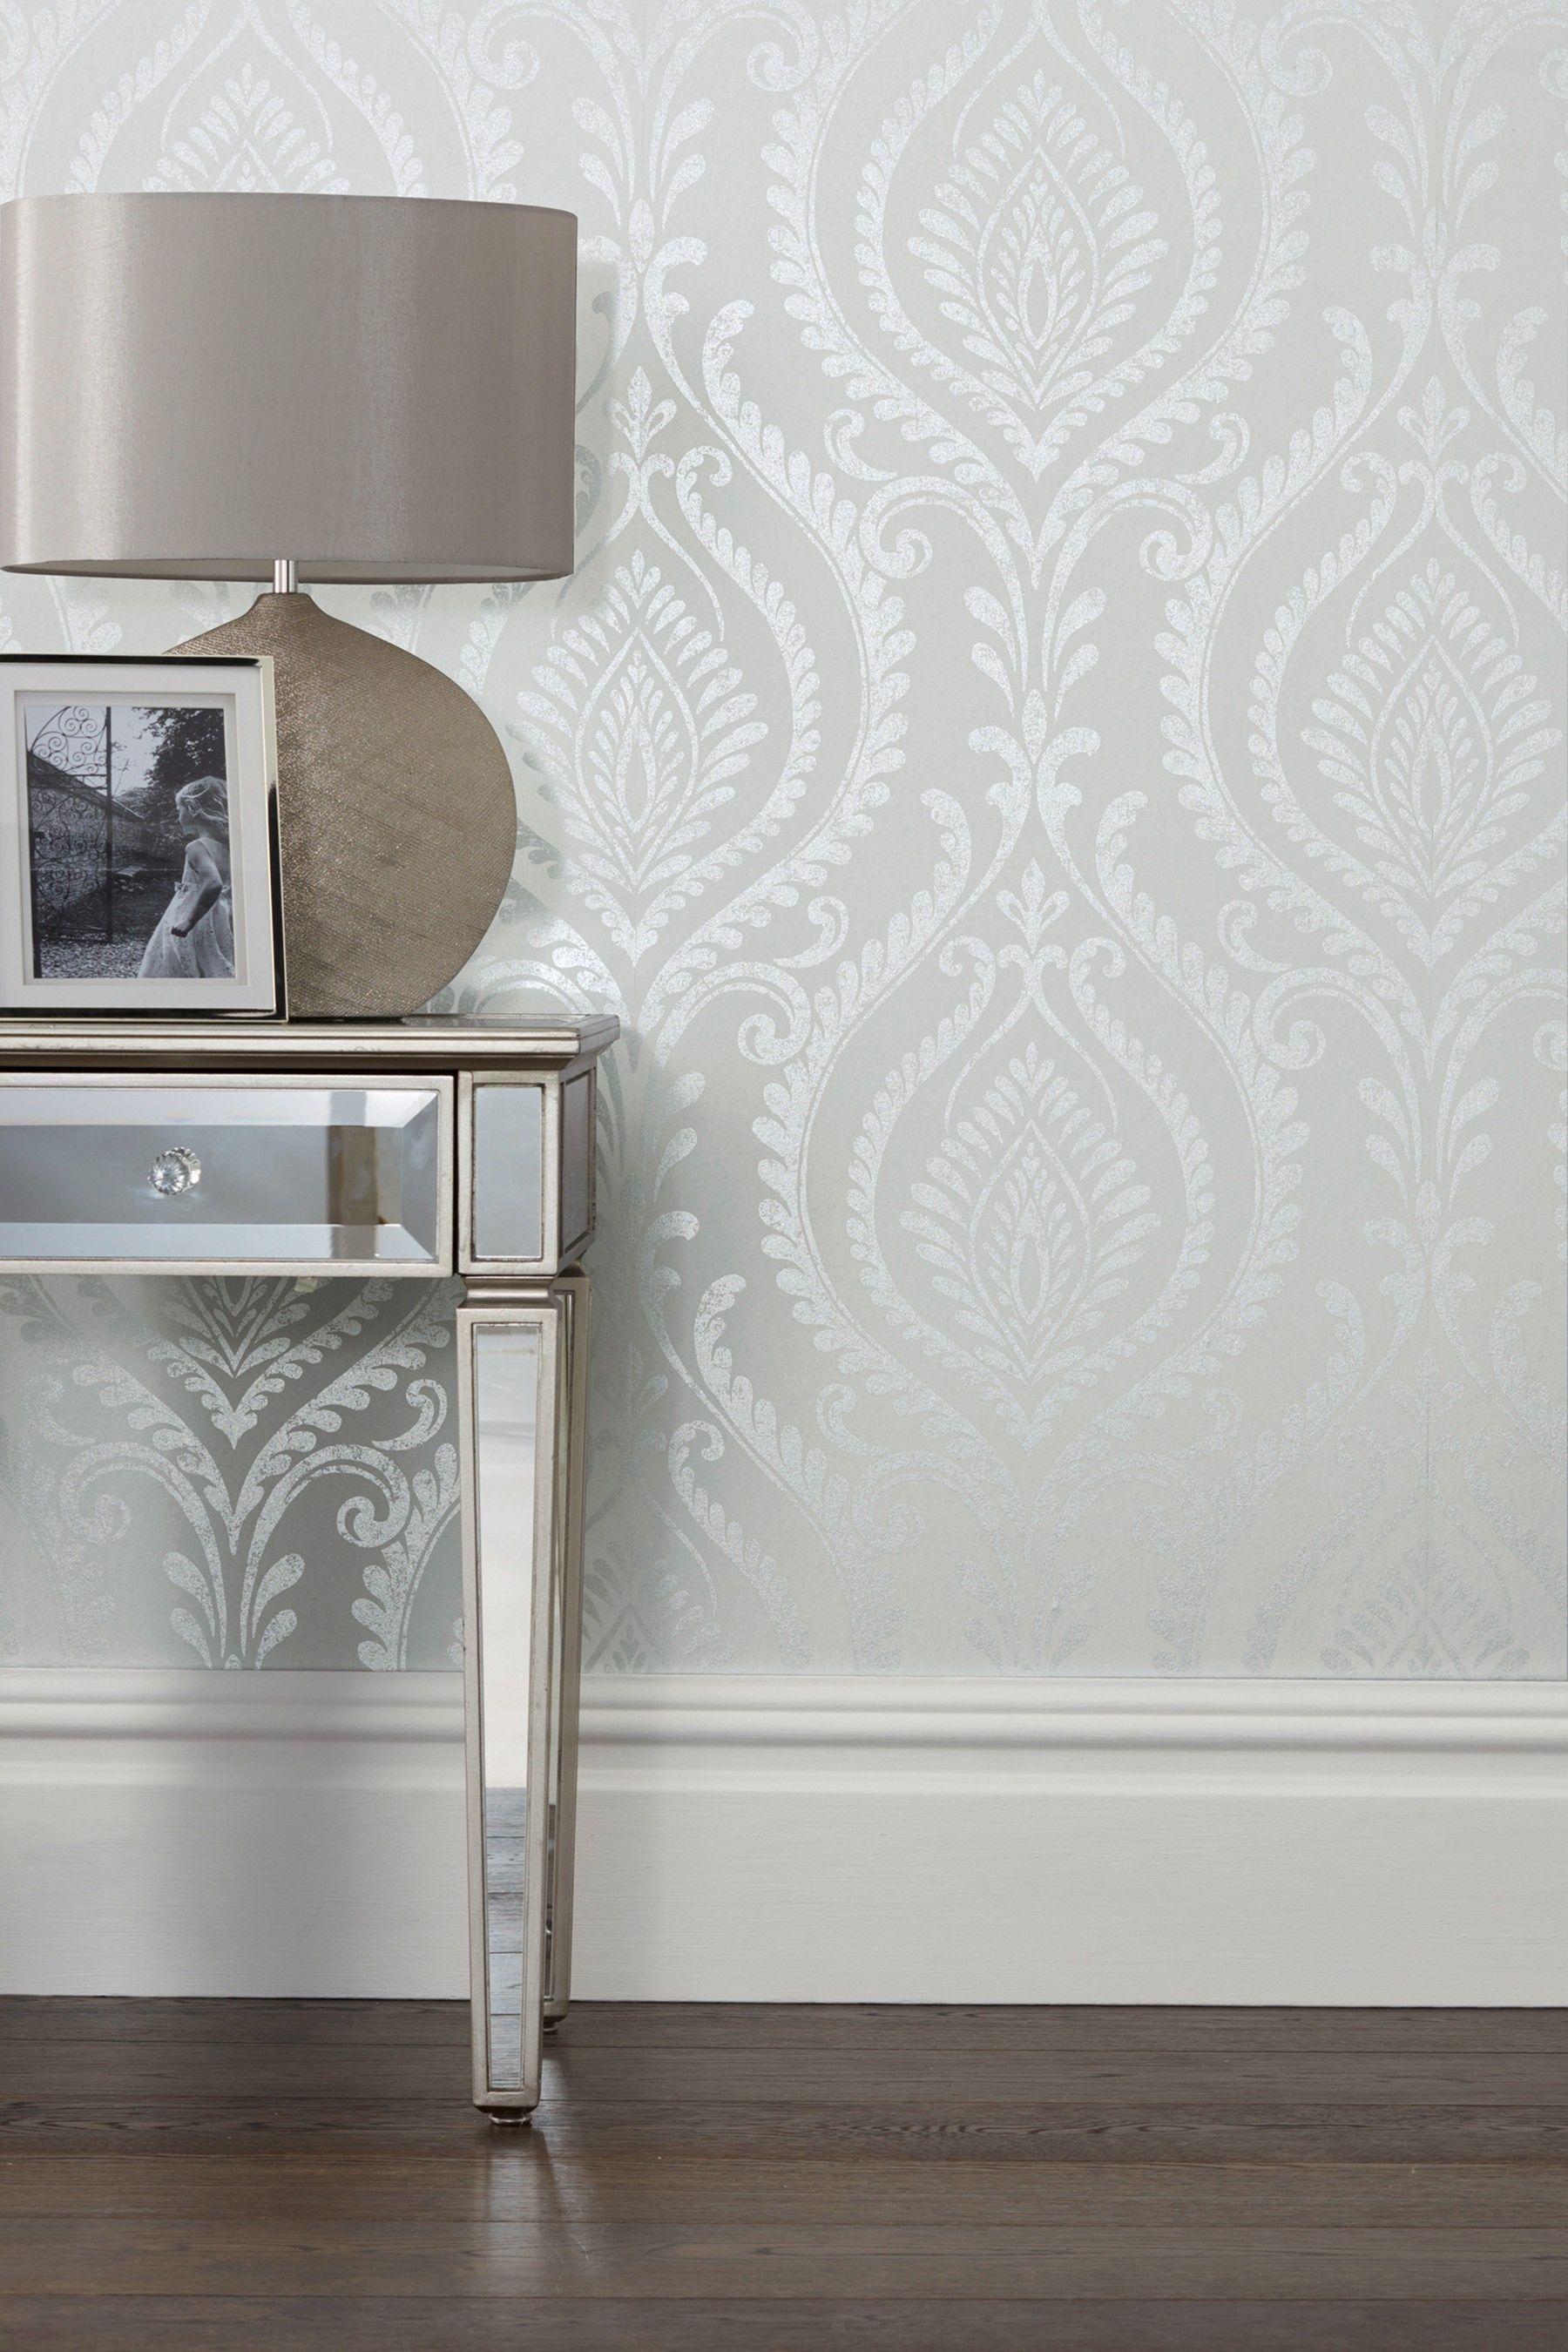 40 Beautiful Bedroom Wallpaper Designs To Enhance Your Beaut